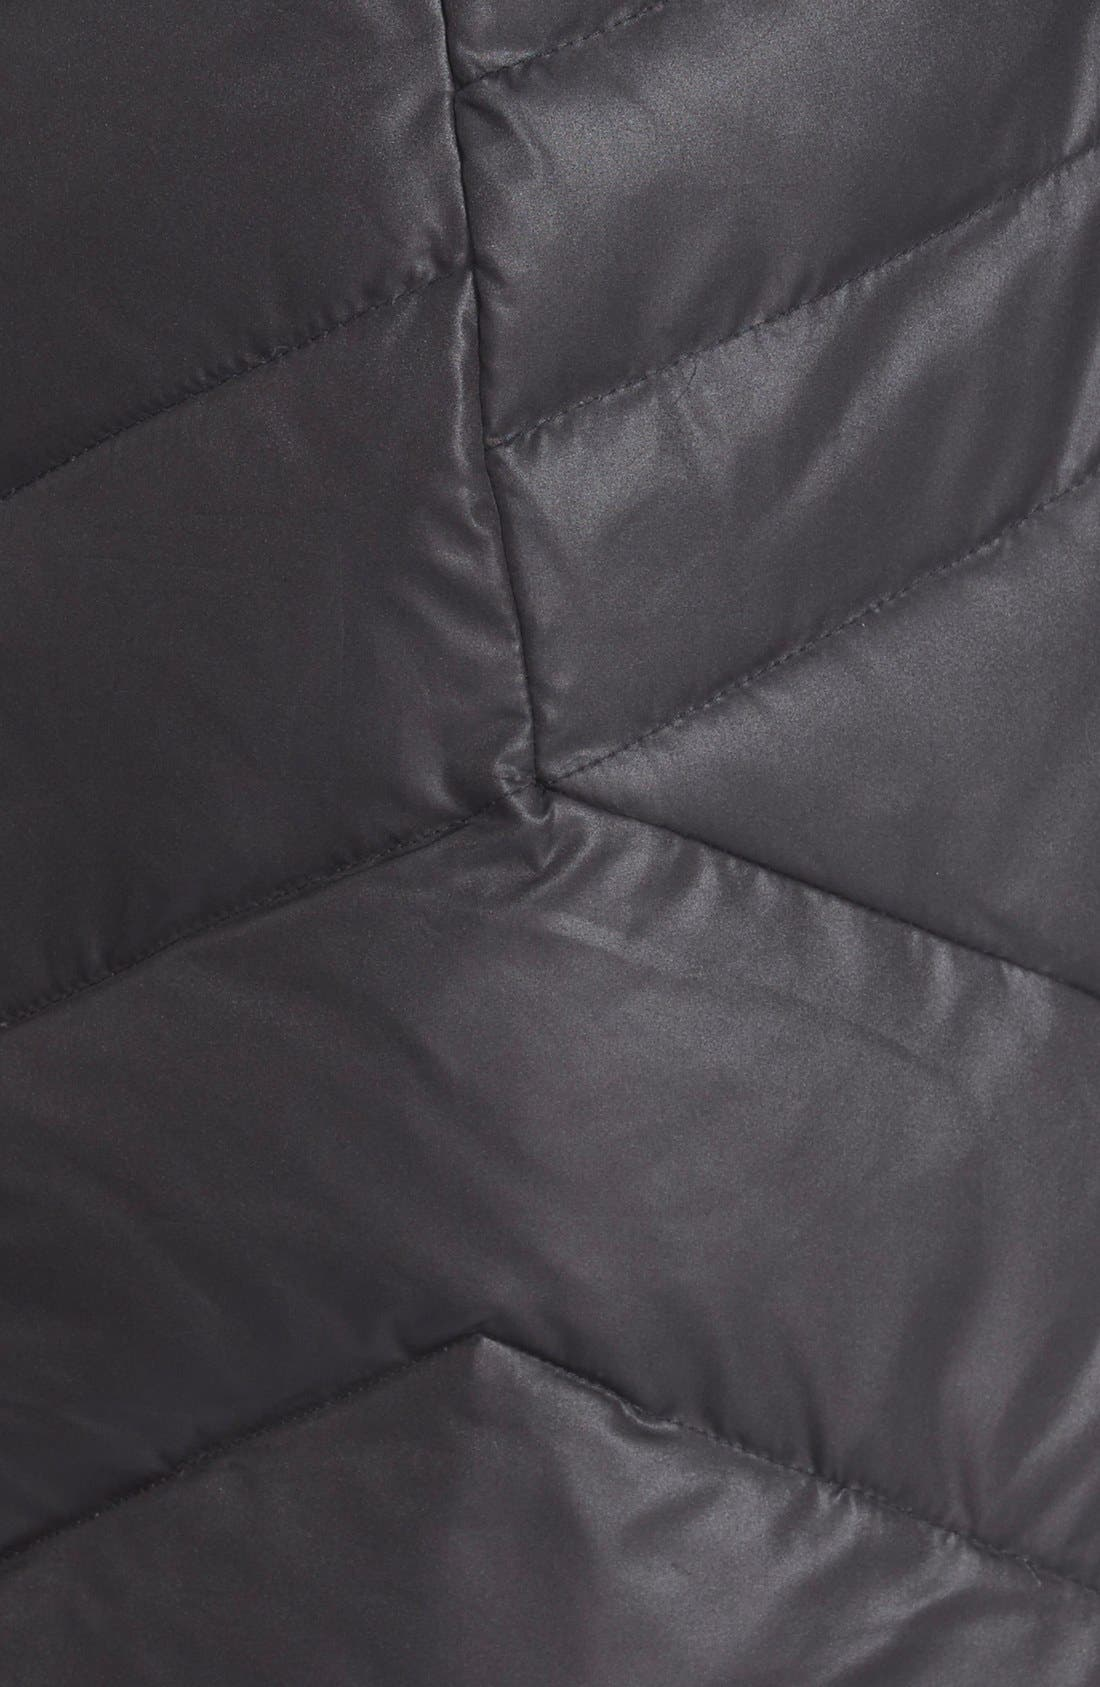 'Mia' FauxFur Trim Hooded Down Coat,                             Alternate thumbnail 3, color,                             001